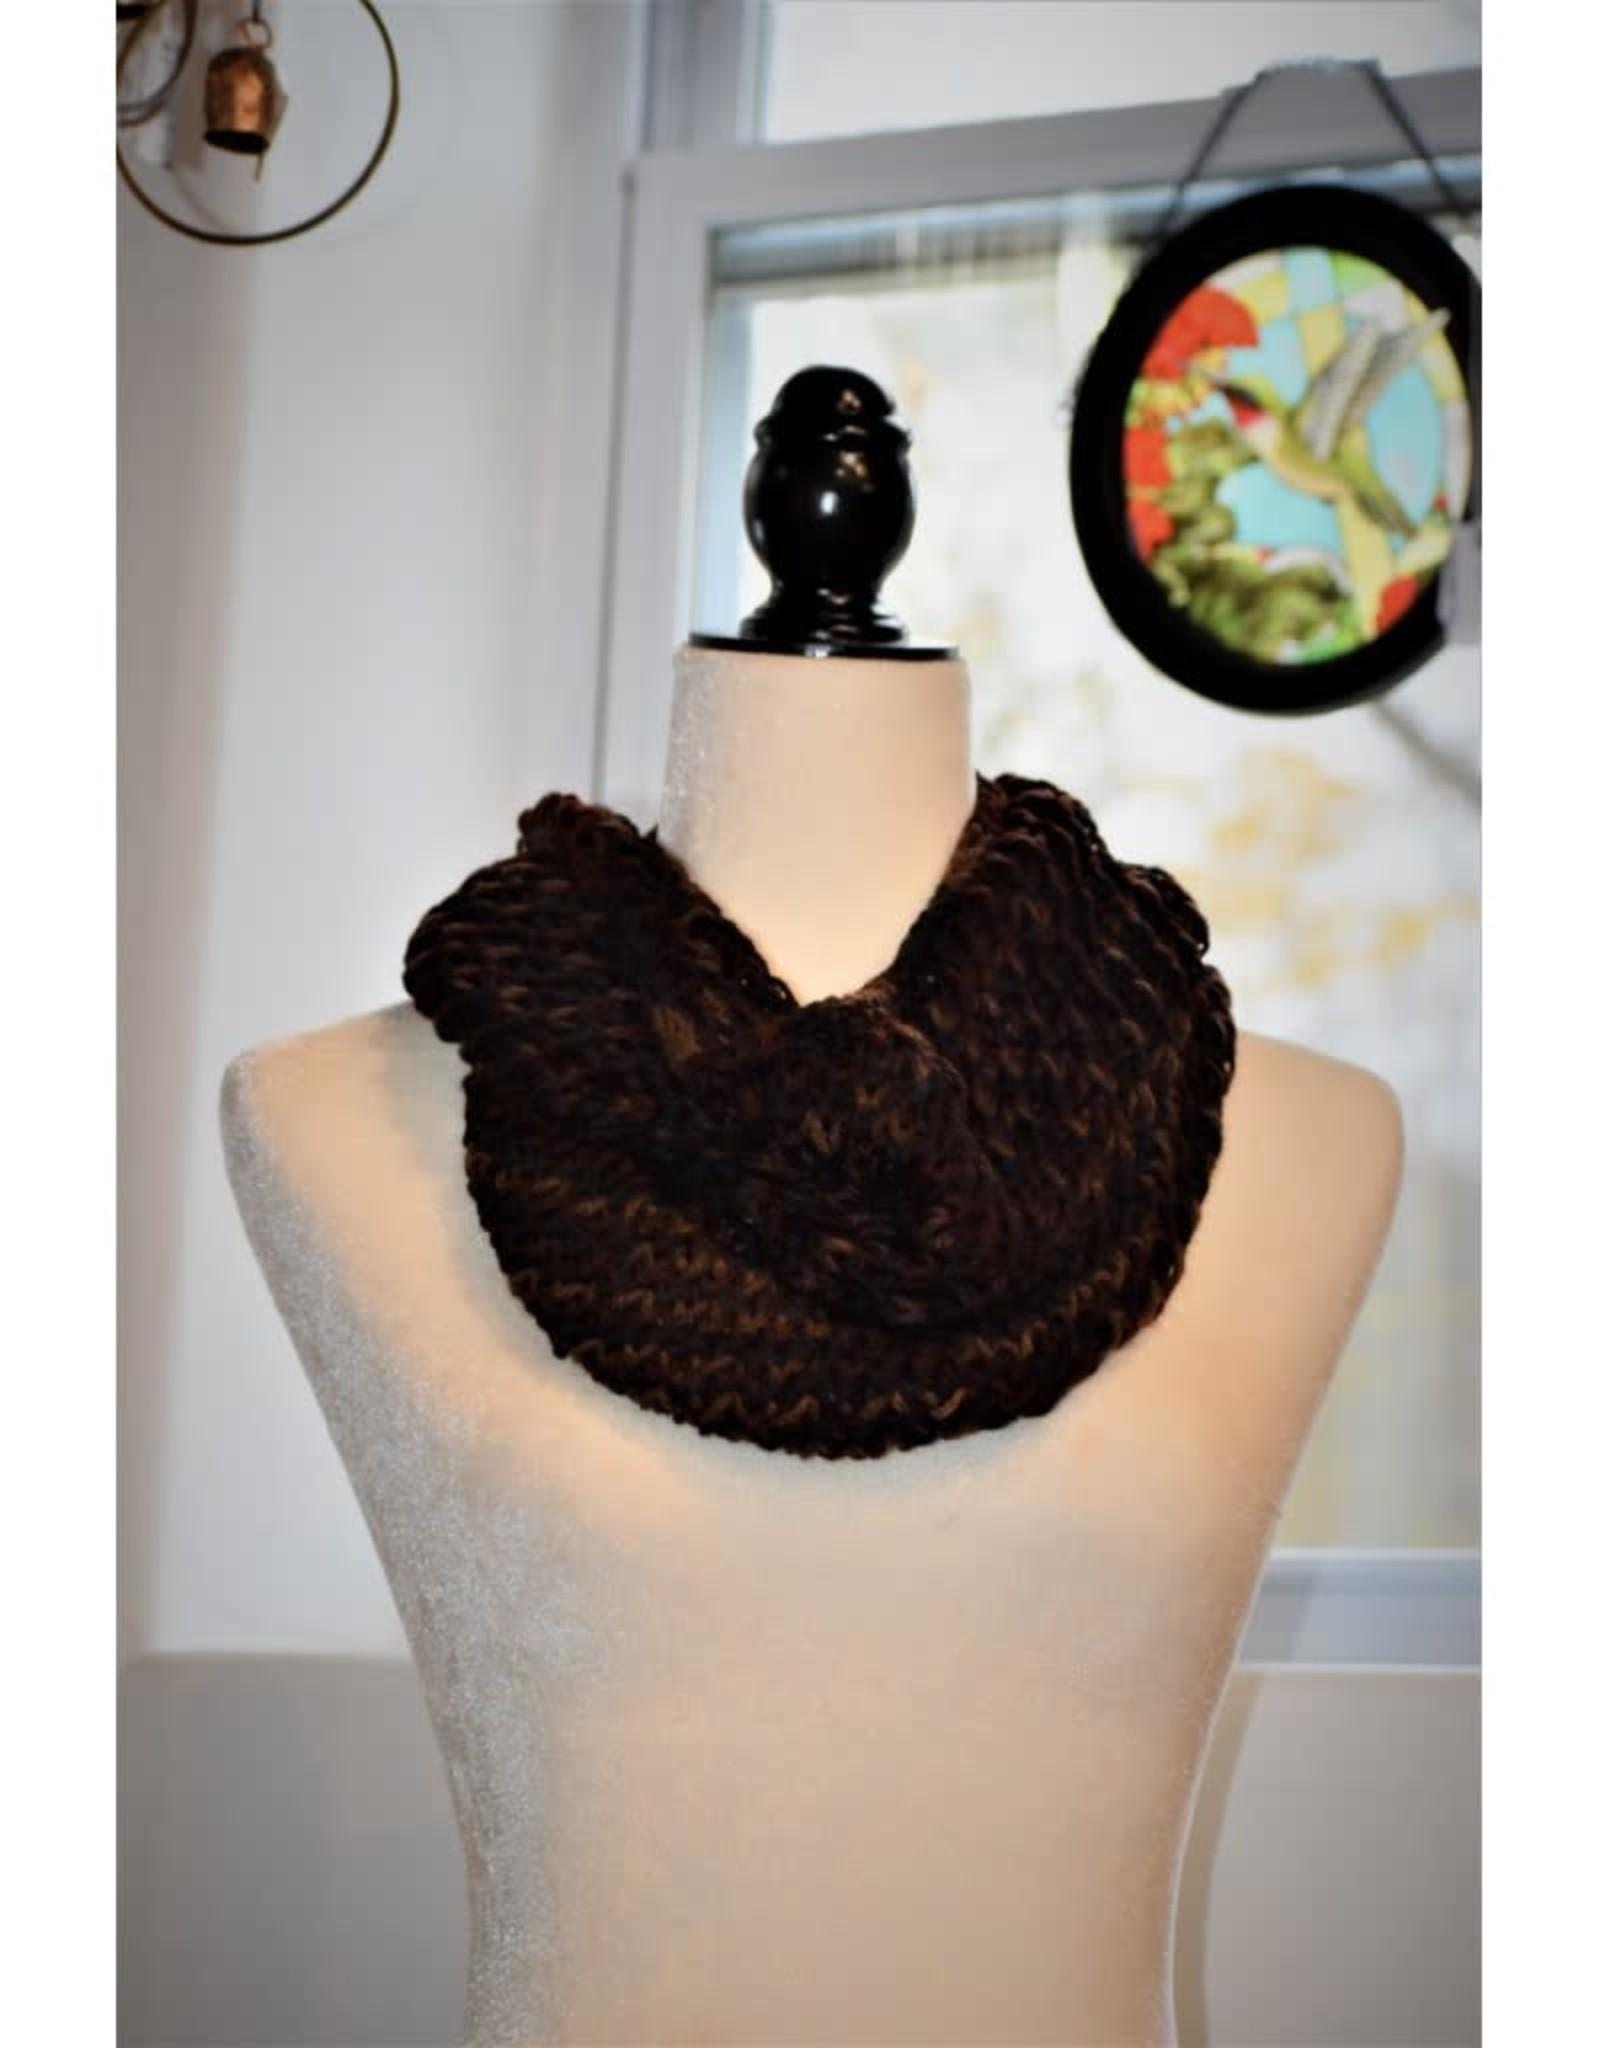 CraftCesi Knit Infinity Scarf - Earthy Shades